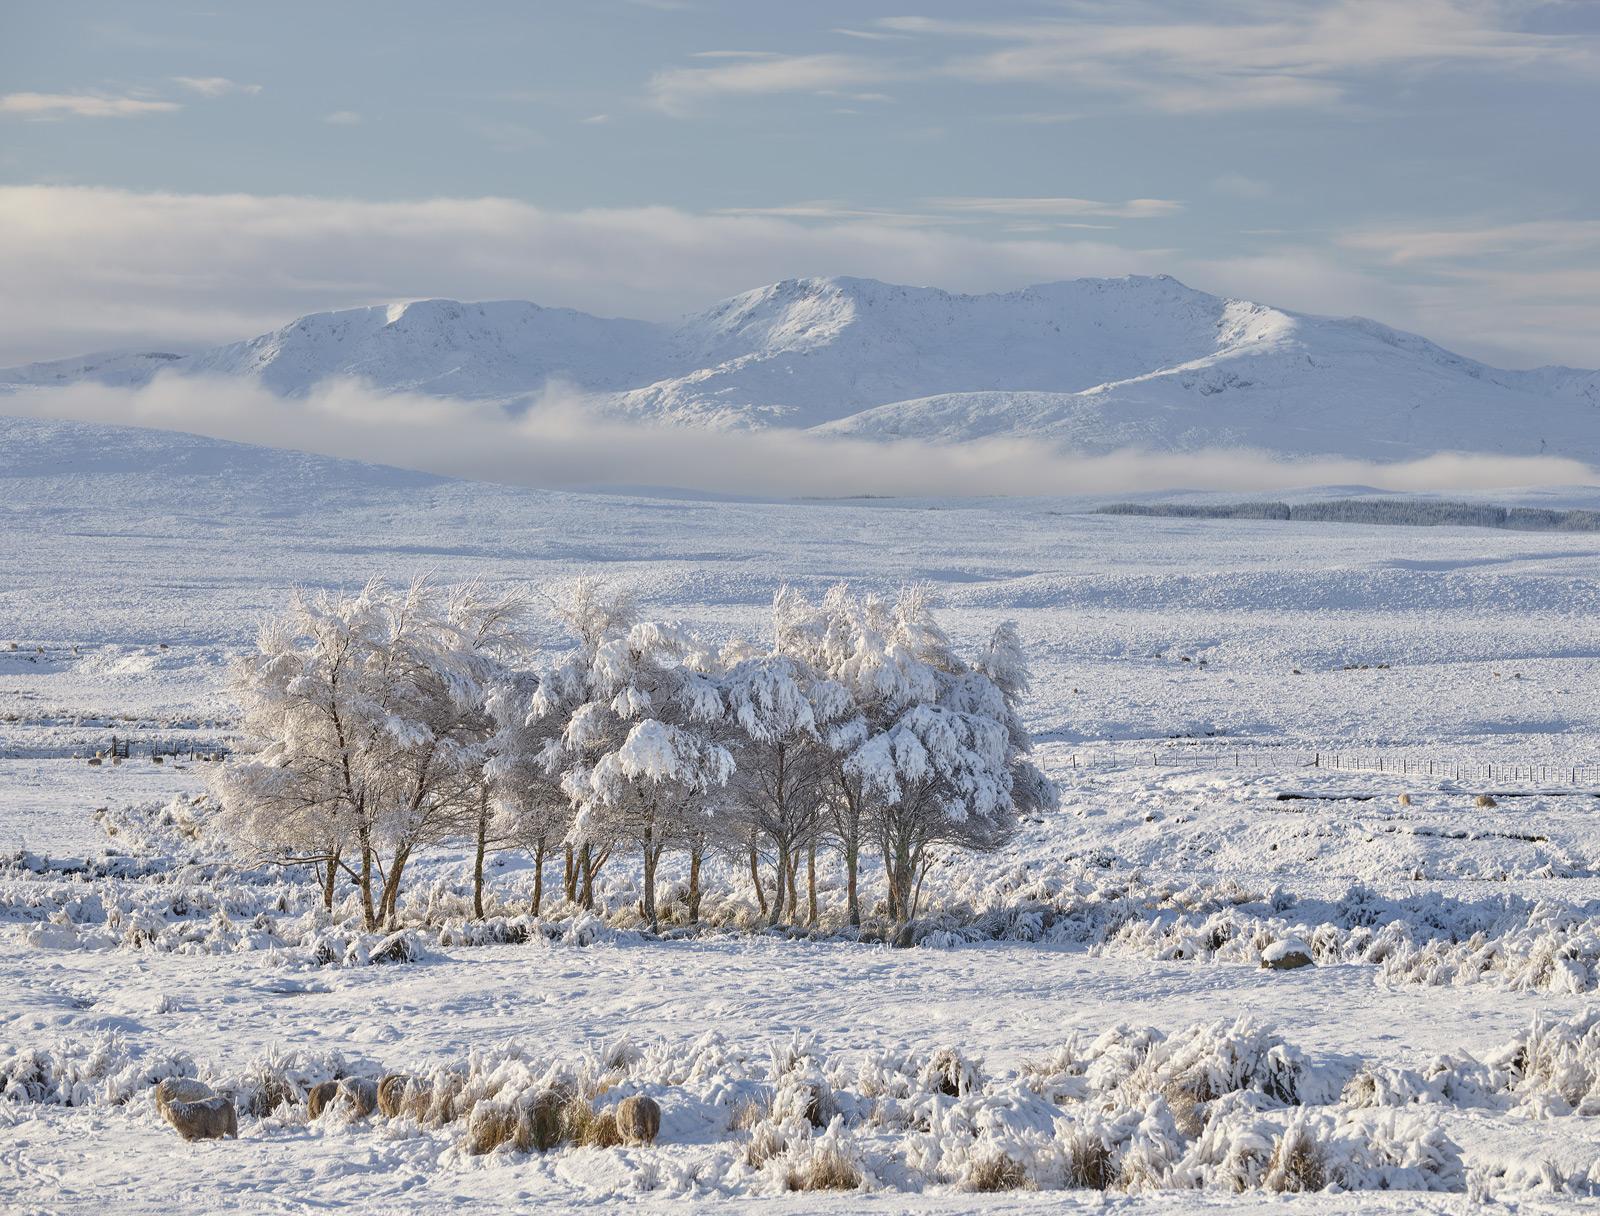 Crask Inn Birches, Crask Inn, Sutherland, Scotland, softly, lit, warmth, clouded, cooler, birches, light, photo